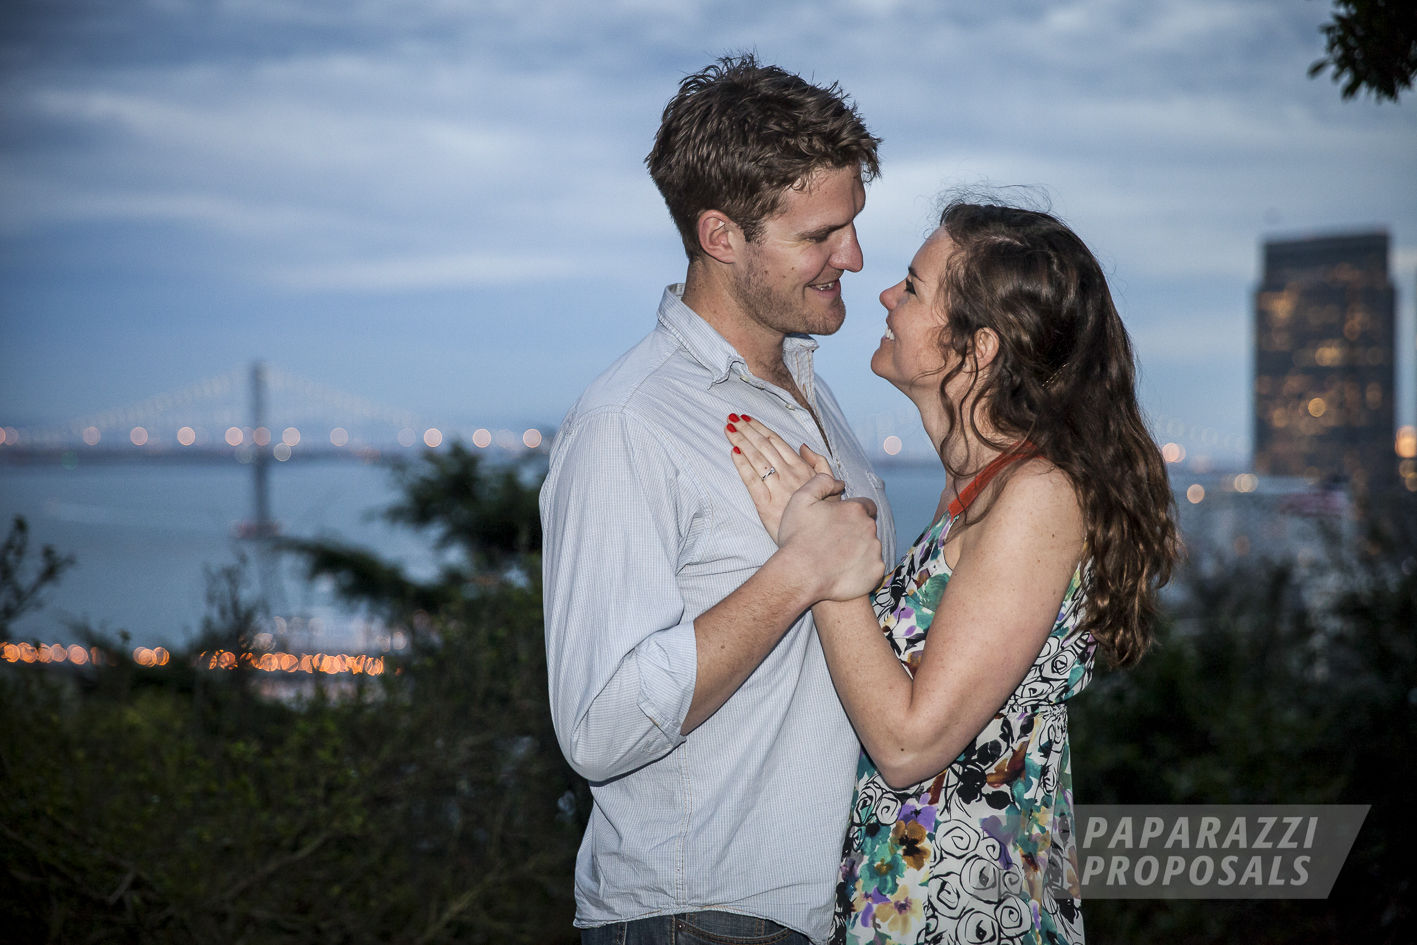 Long distance dating san jose and sacramento